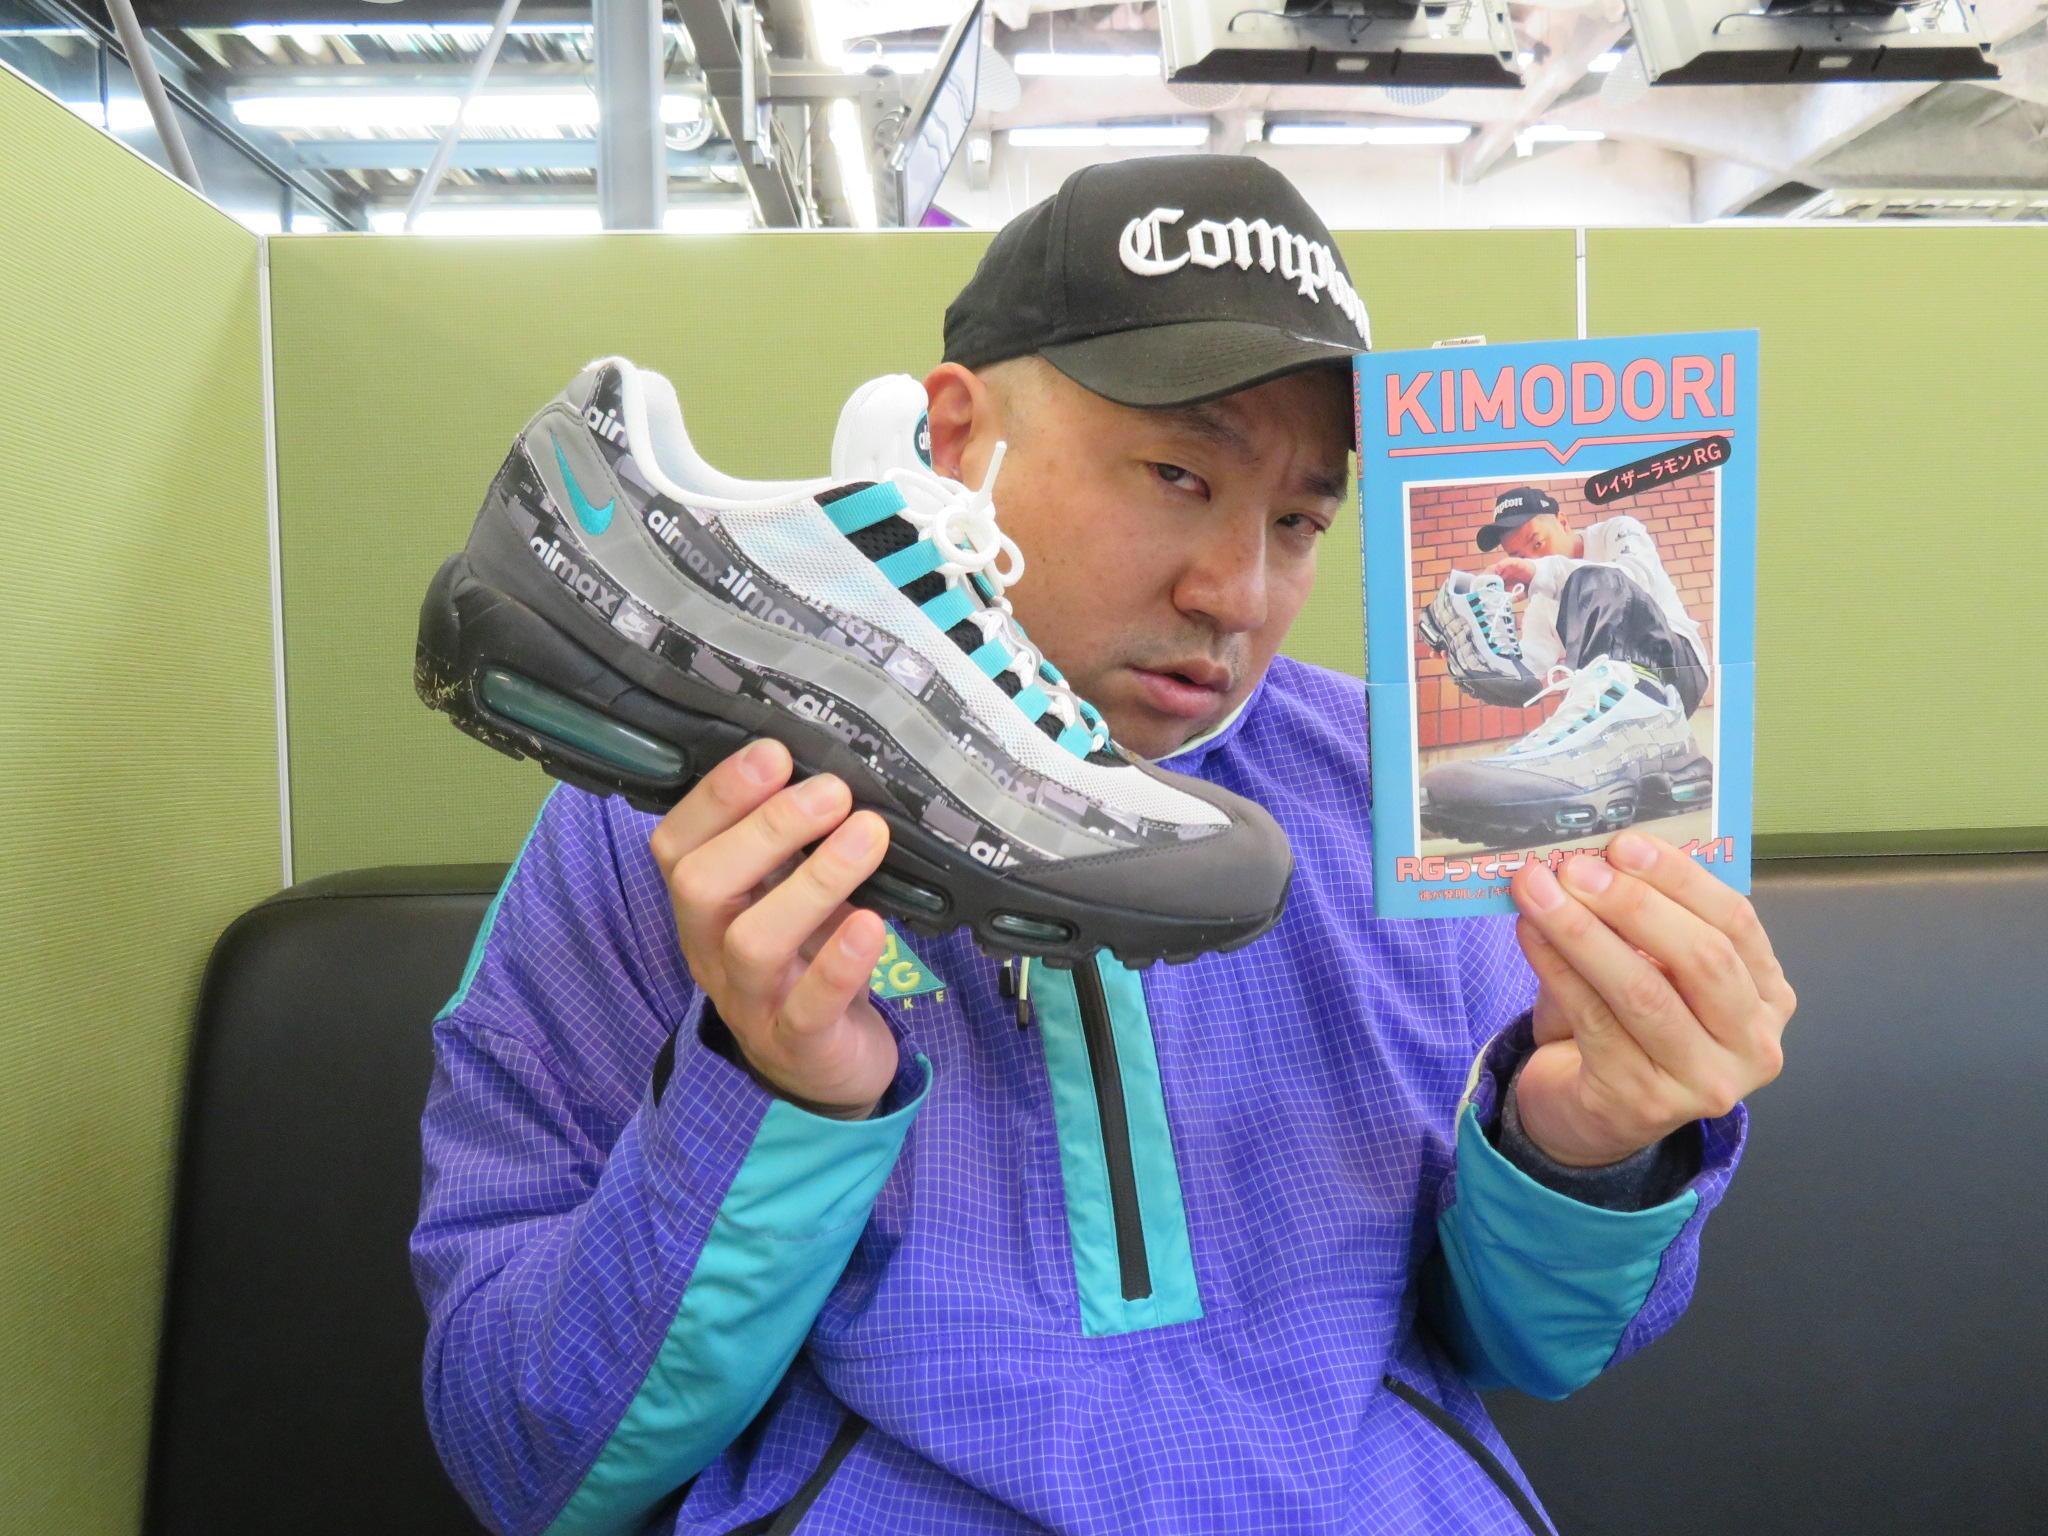 http://news.yoshimoto.co.jp/20181229124831-e26aaacff1ba099a14af066f07635ab4dba698c3.jpg